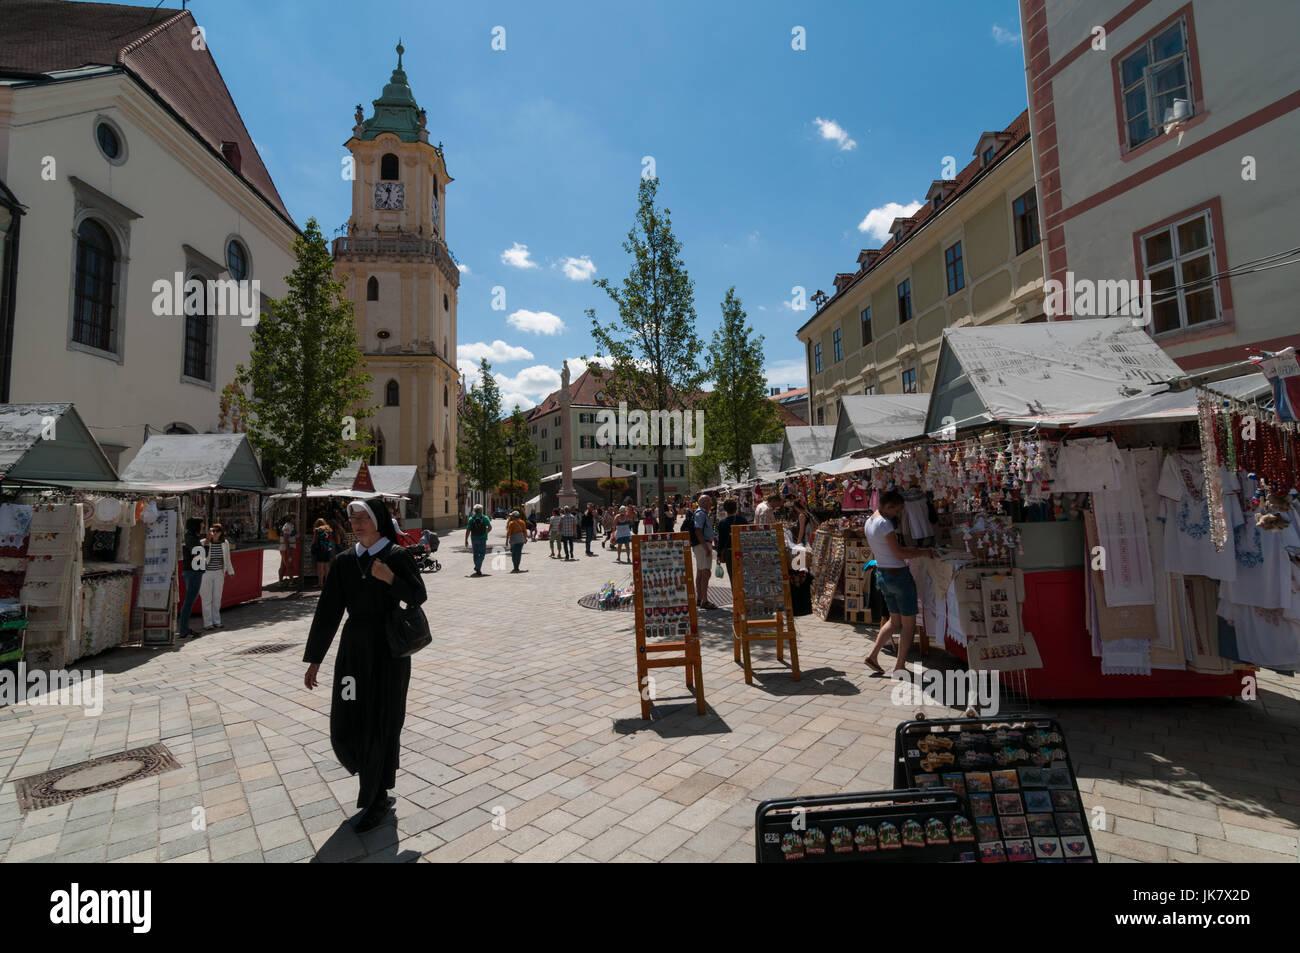 Main Square, Old Town, Bratislava, Slovakia - Stock Image